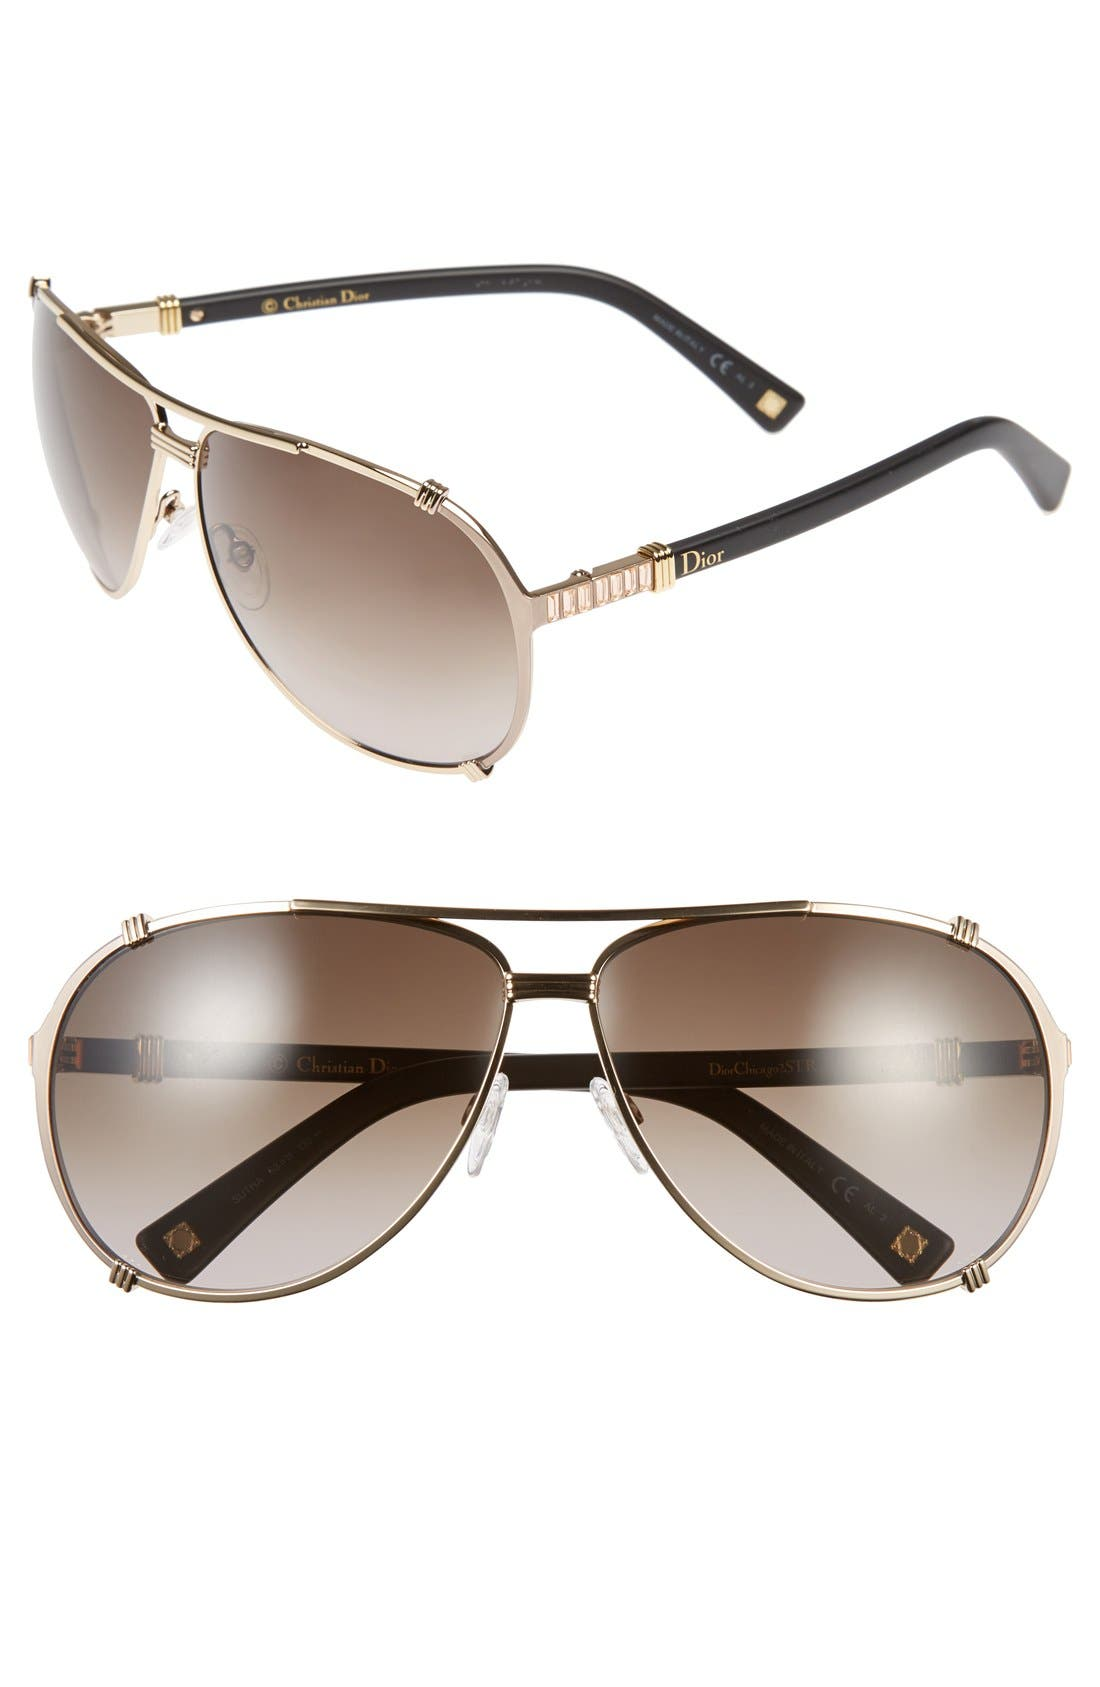 Alternate Image 1 Selected - Dior 'Chicago 2 Strass' 63mm Aviator Sunglasses